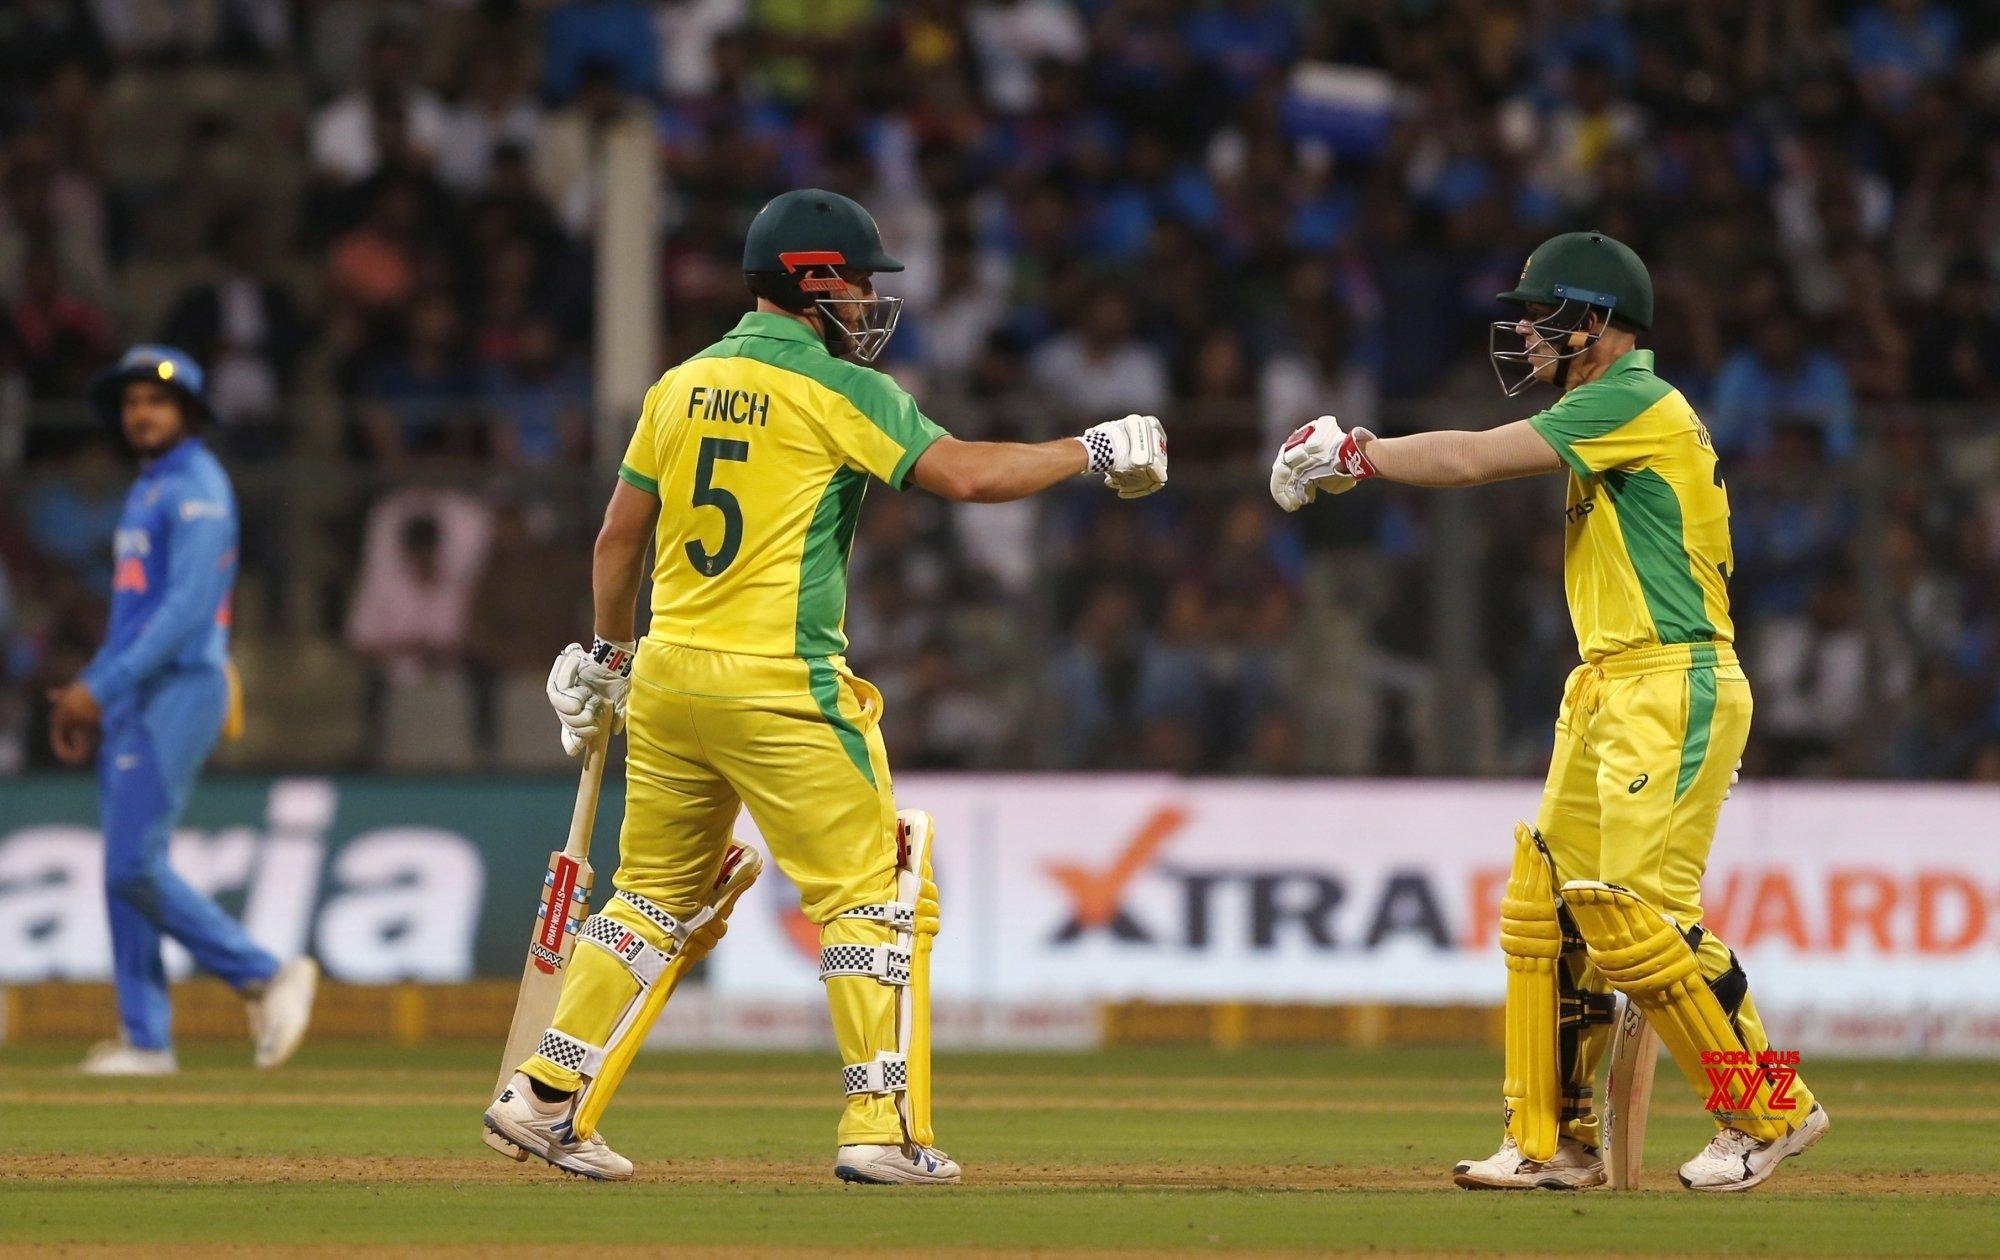 Smith's 134, Hall's 48: India's last 10-wkt ODI loss at home